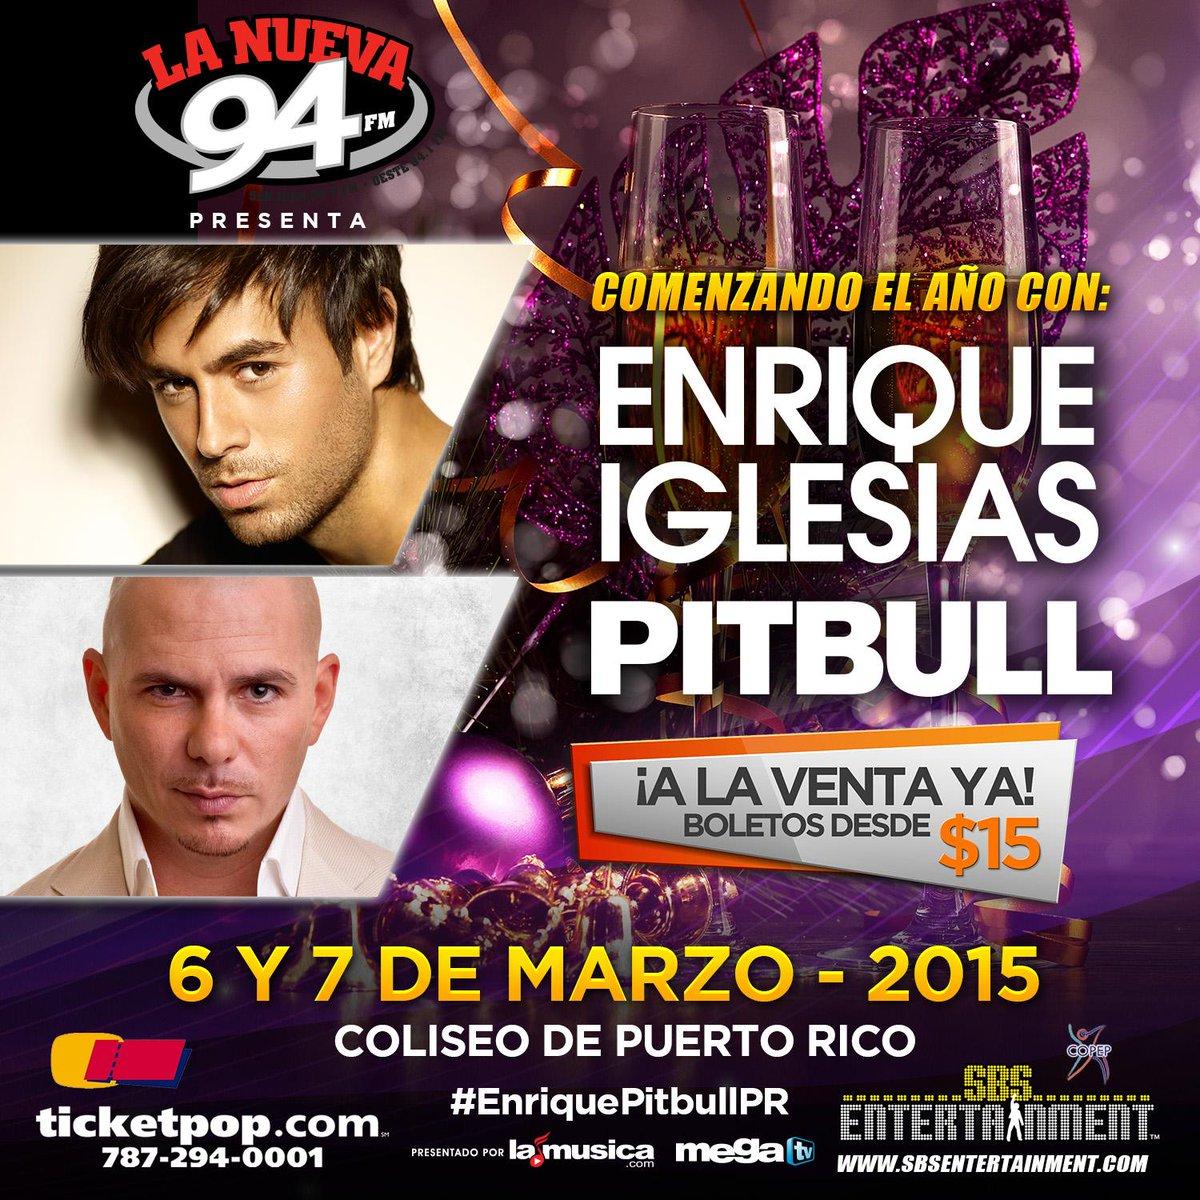 ¿A quiénes invitarás para el concierto de @enrique305 + @Pitbull? http://t.co/kmSMDFkwY7 #EnriquePitbullPR http://t.co/PhTqlvwhdi